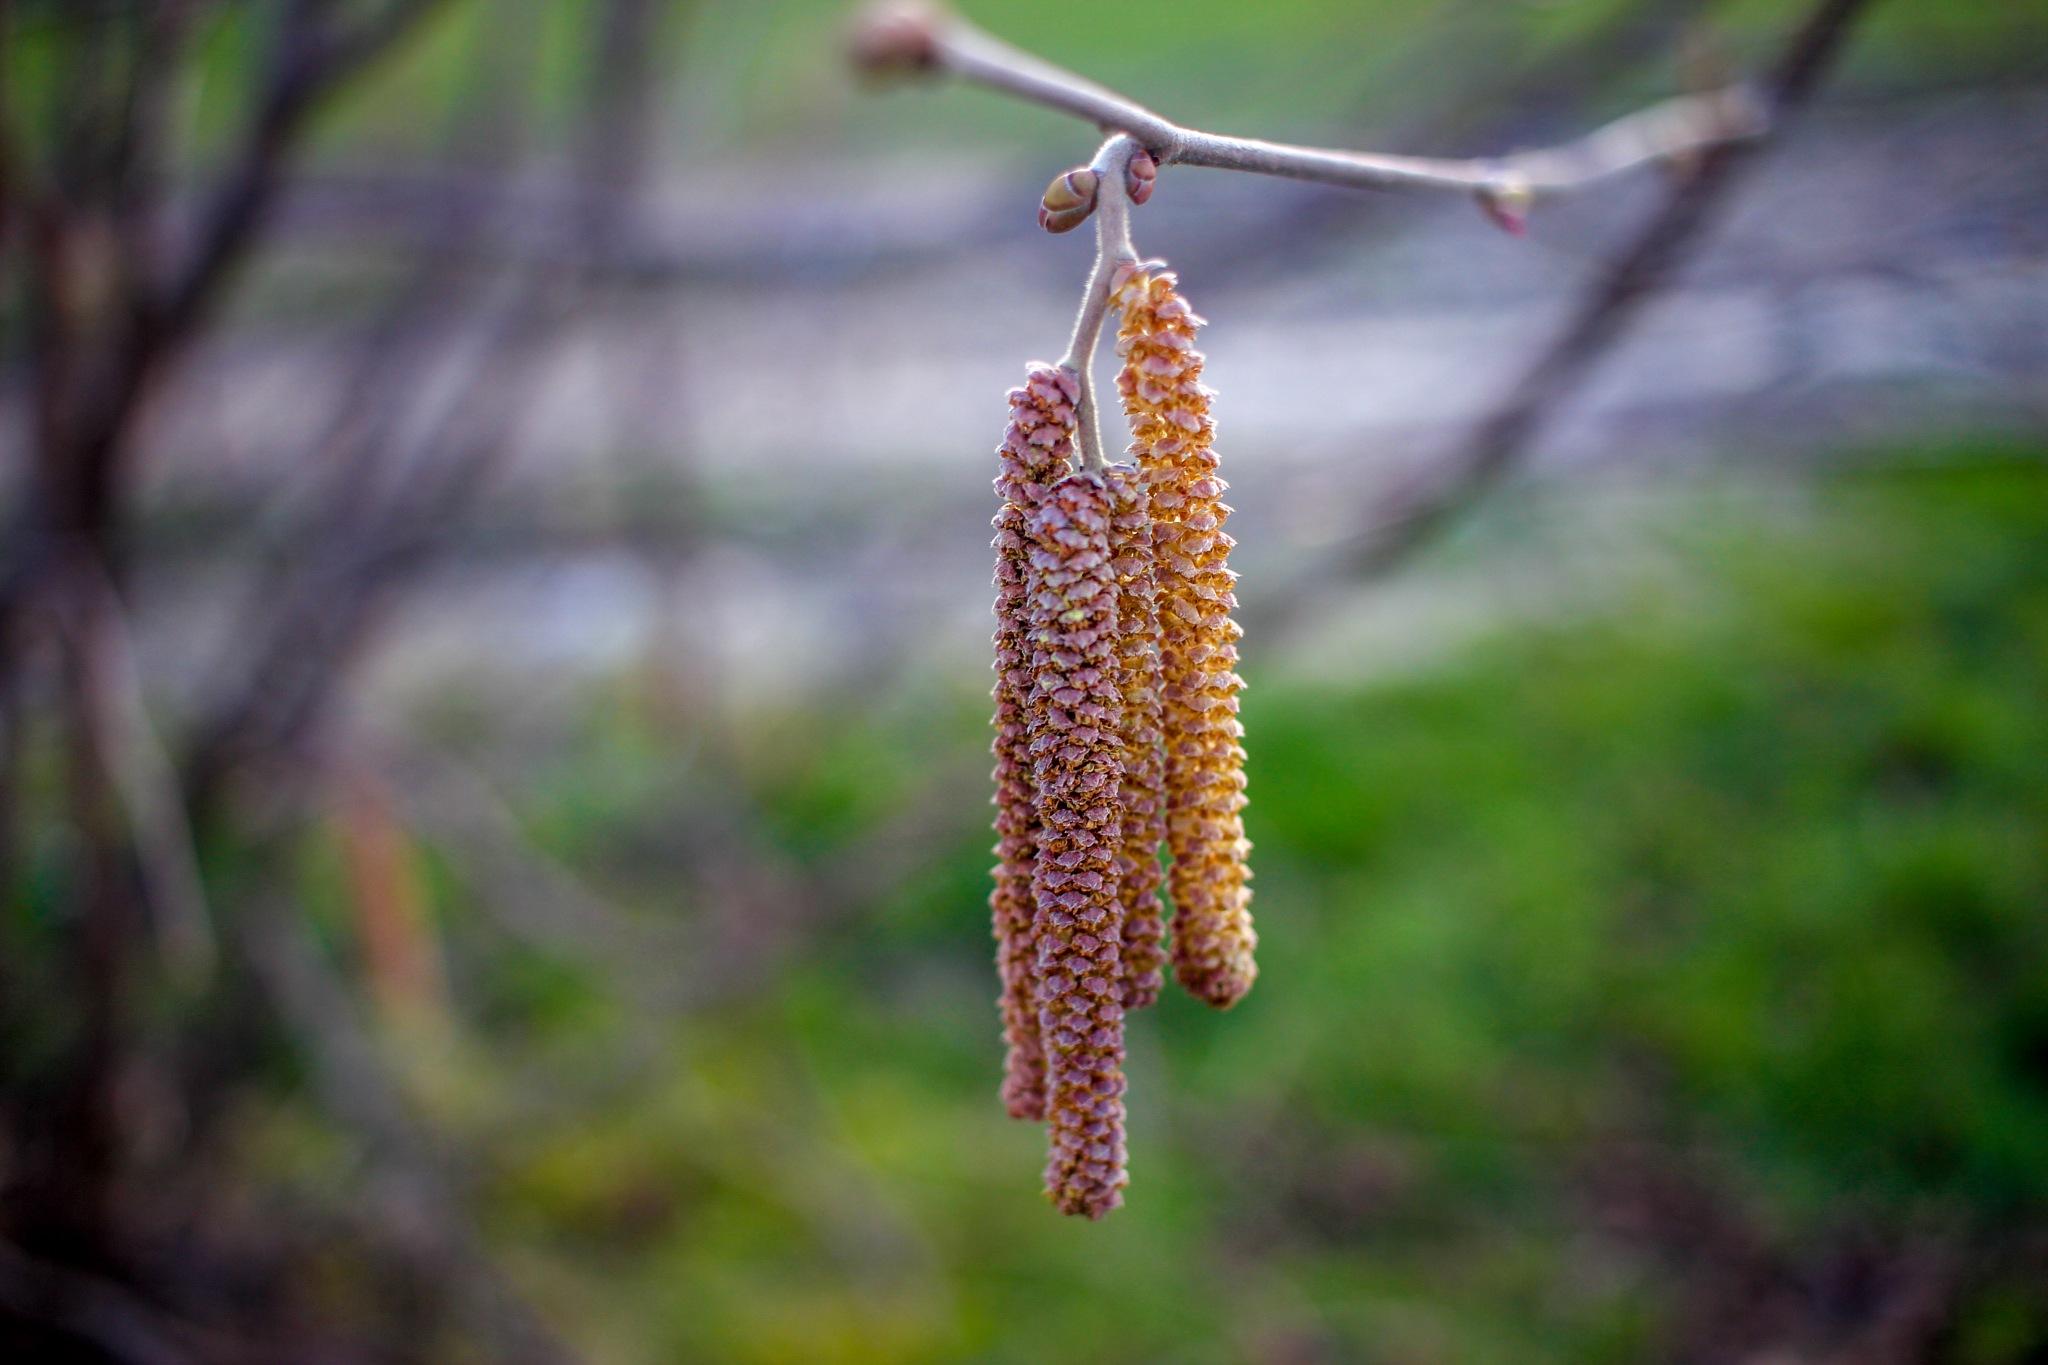 ...springtime buds by Adi Red